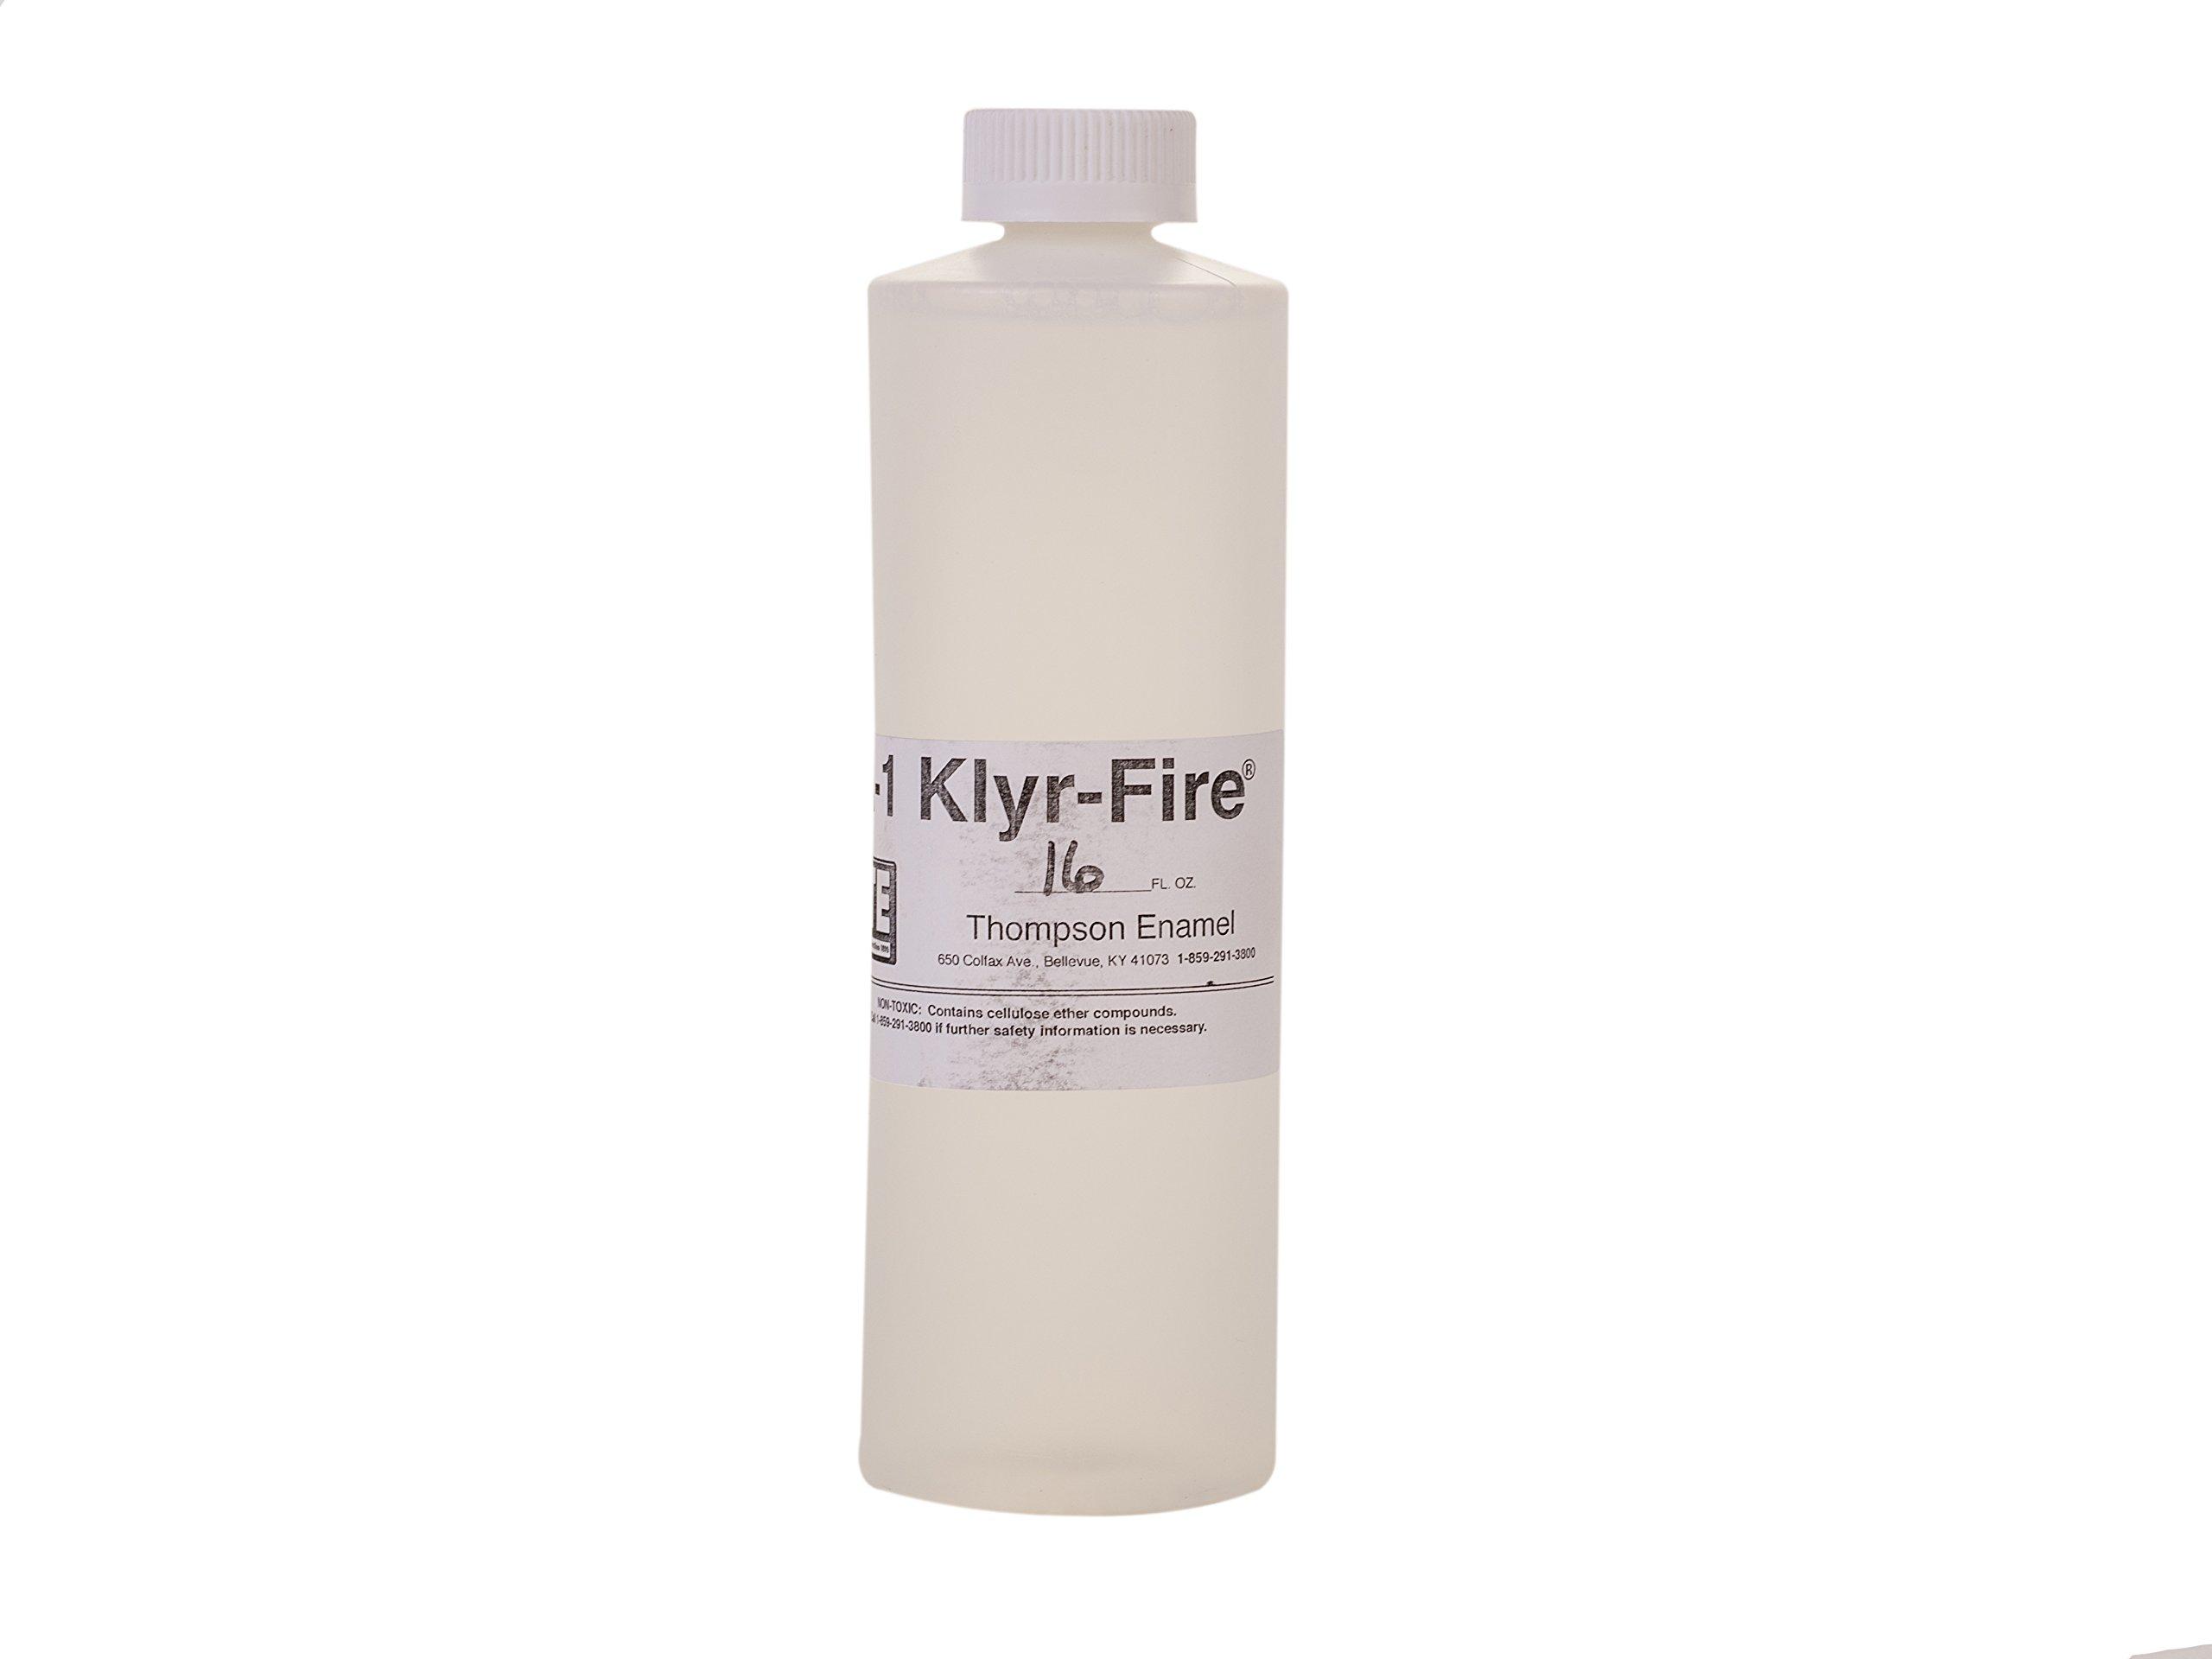 Thompson Klyr-Fire - 16 Oz